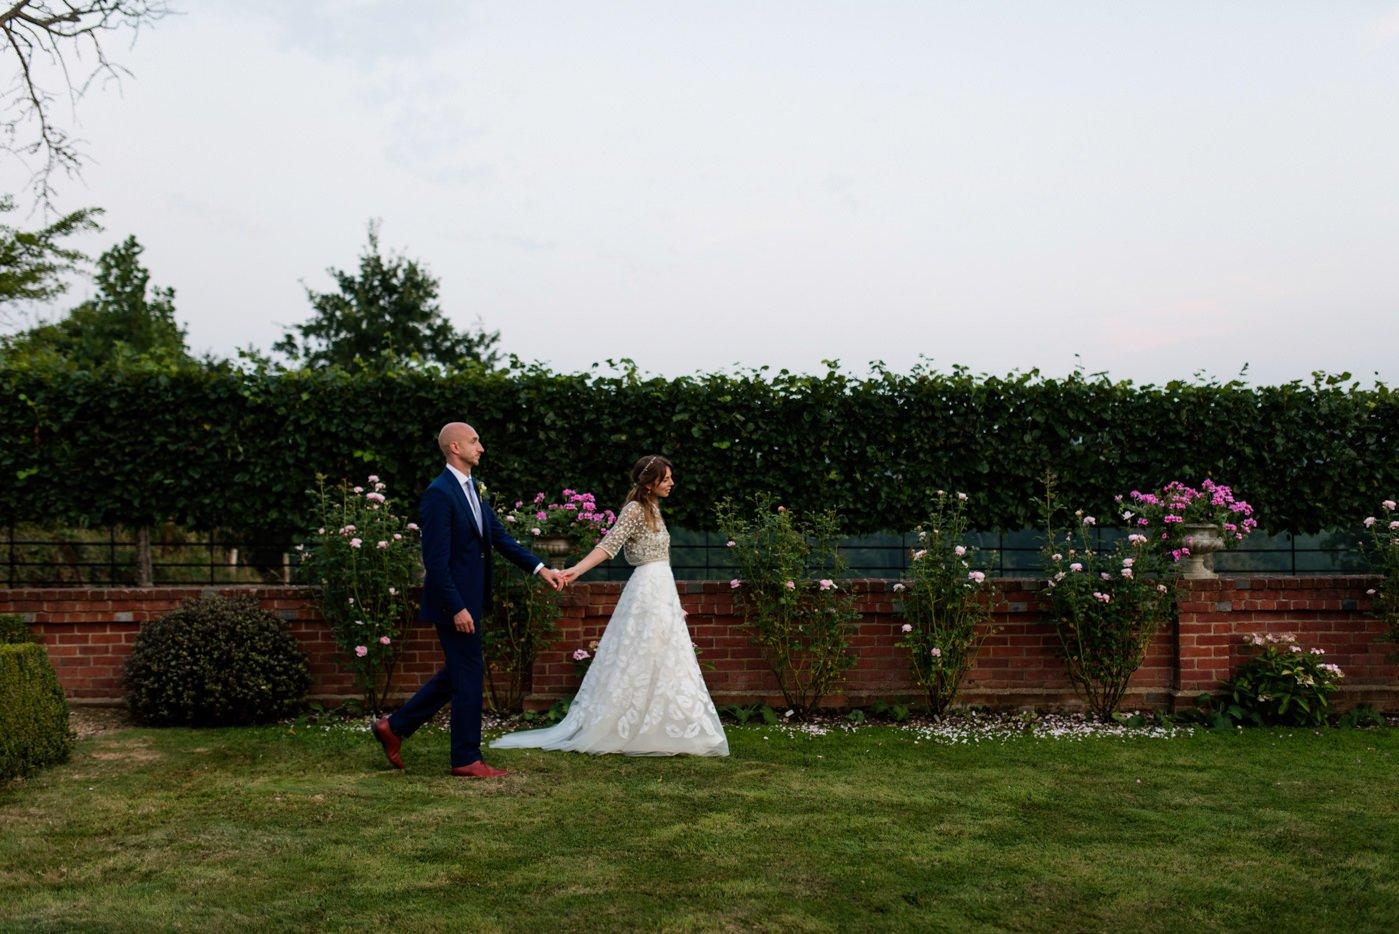 bignor-park-wedding-photography-robyn-and-tom-108